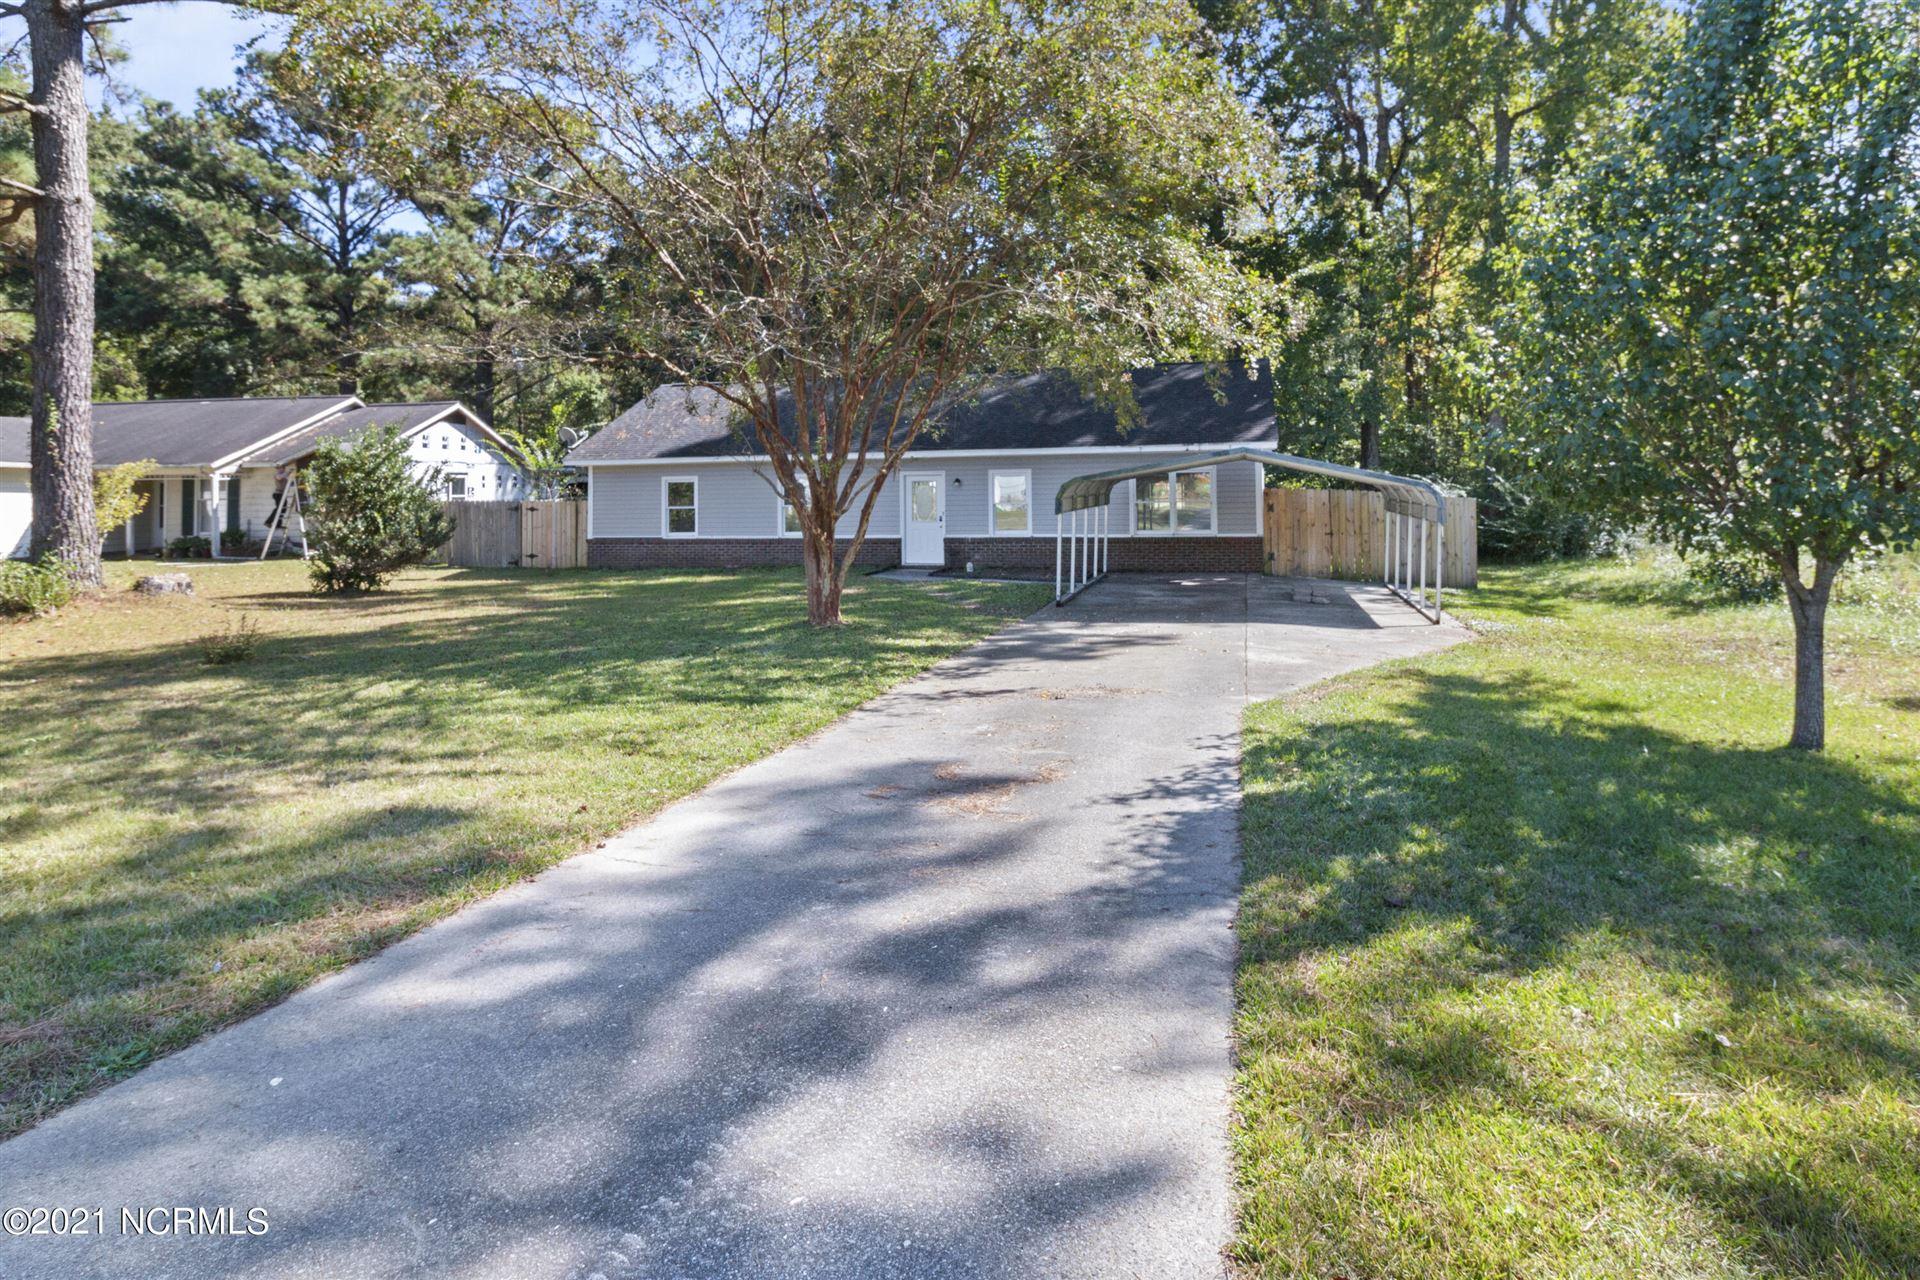 Photo of 1006 Birchwood Lane, Jacksonville, NC 28546 (MLS # 100292619)